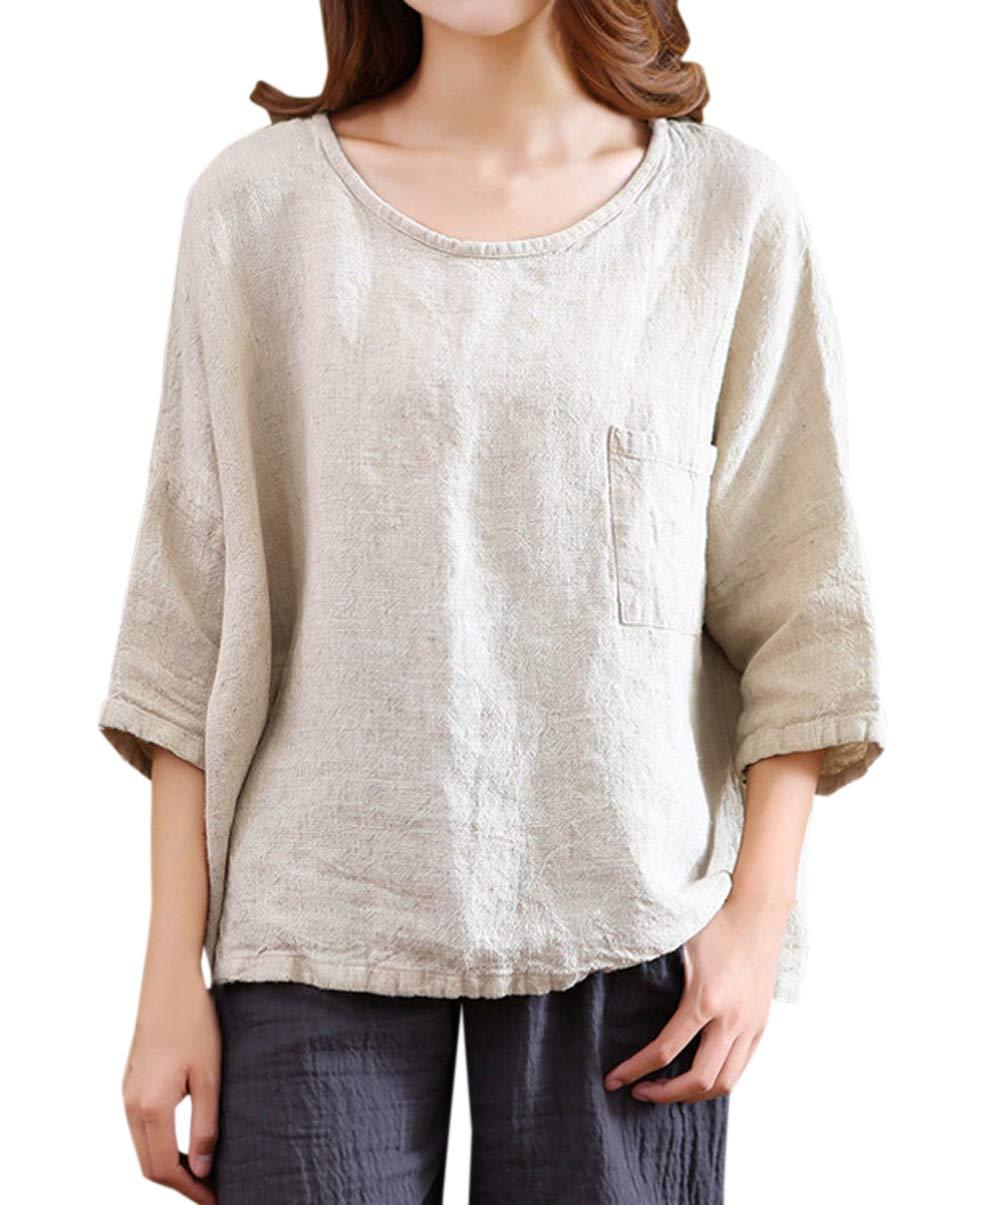 Tops Mujeres Suelto Lino T-Shirt Blusa Tees Tumblr Moda Cuello Redondo Manga 3/4 Camisetas Blouses: Amazon.es: Ropa y accesorios